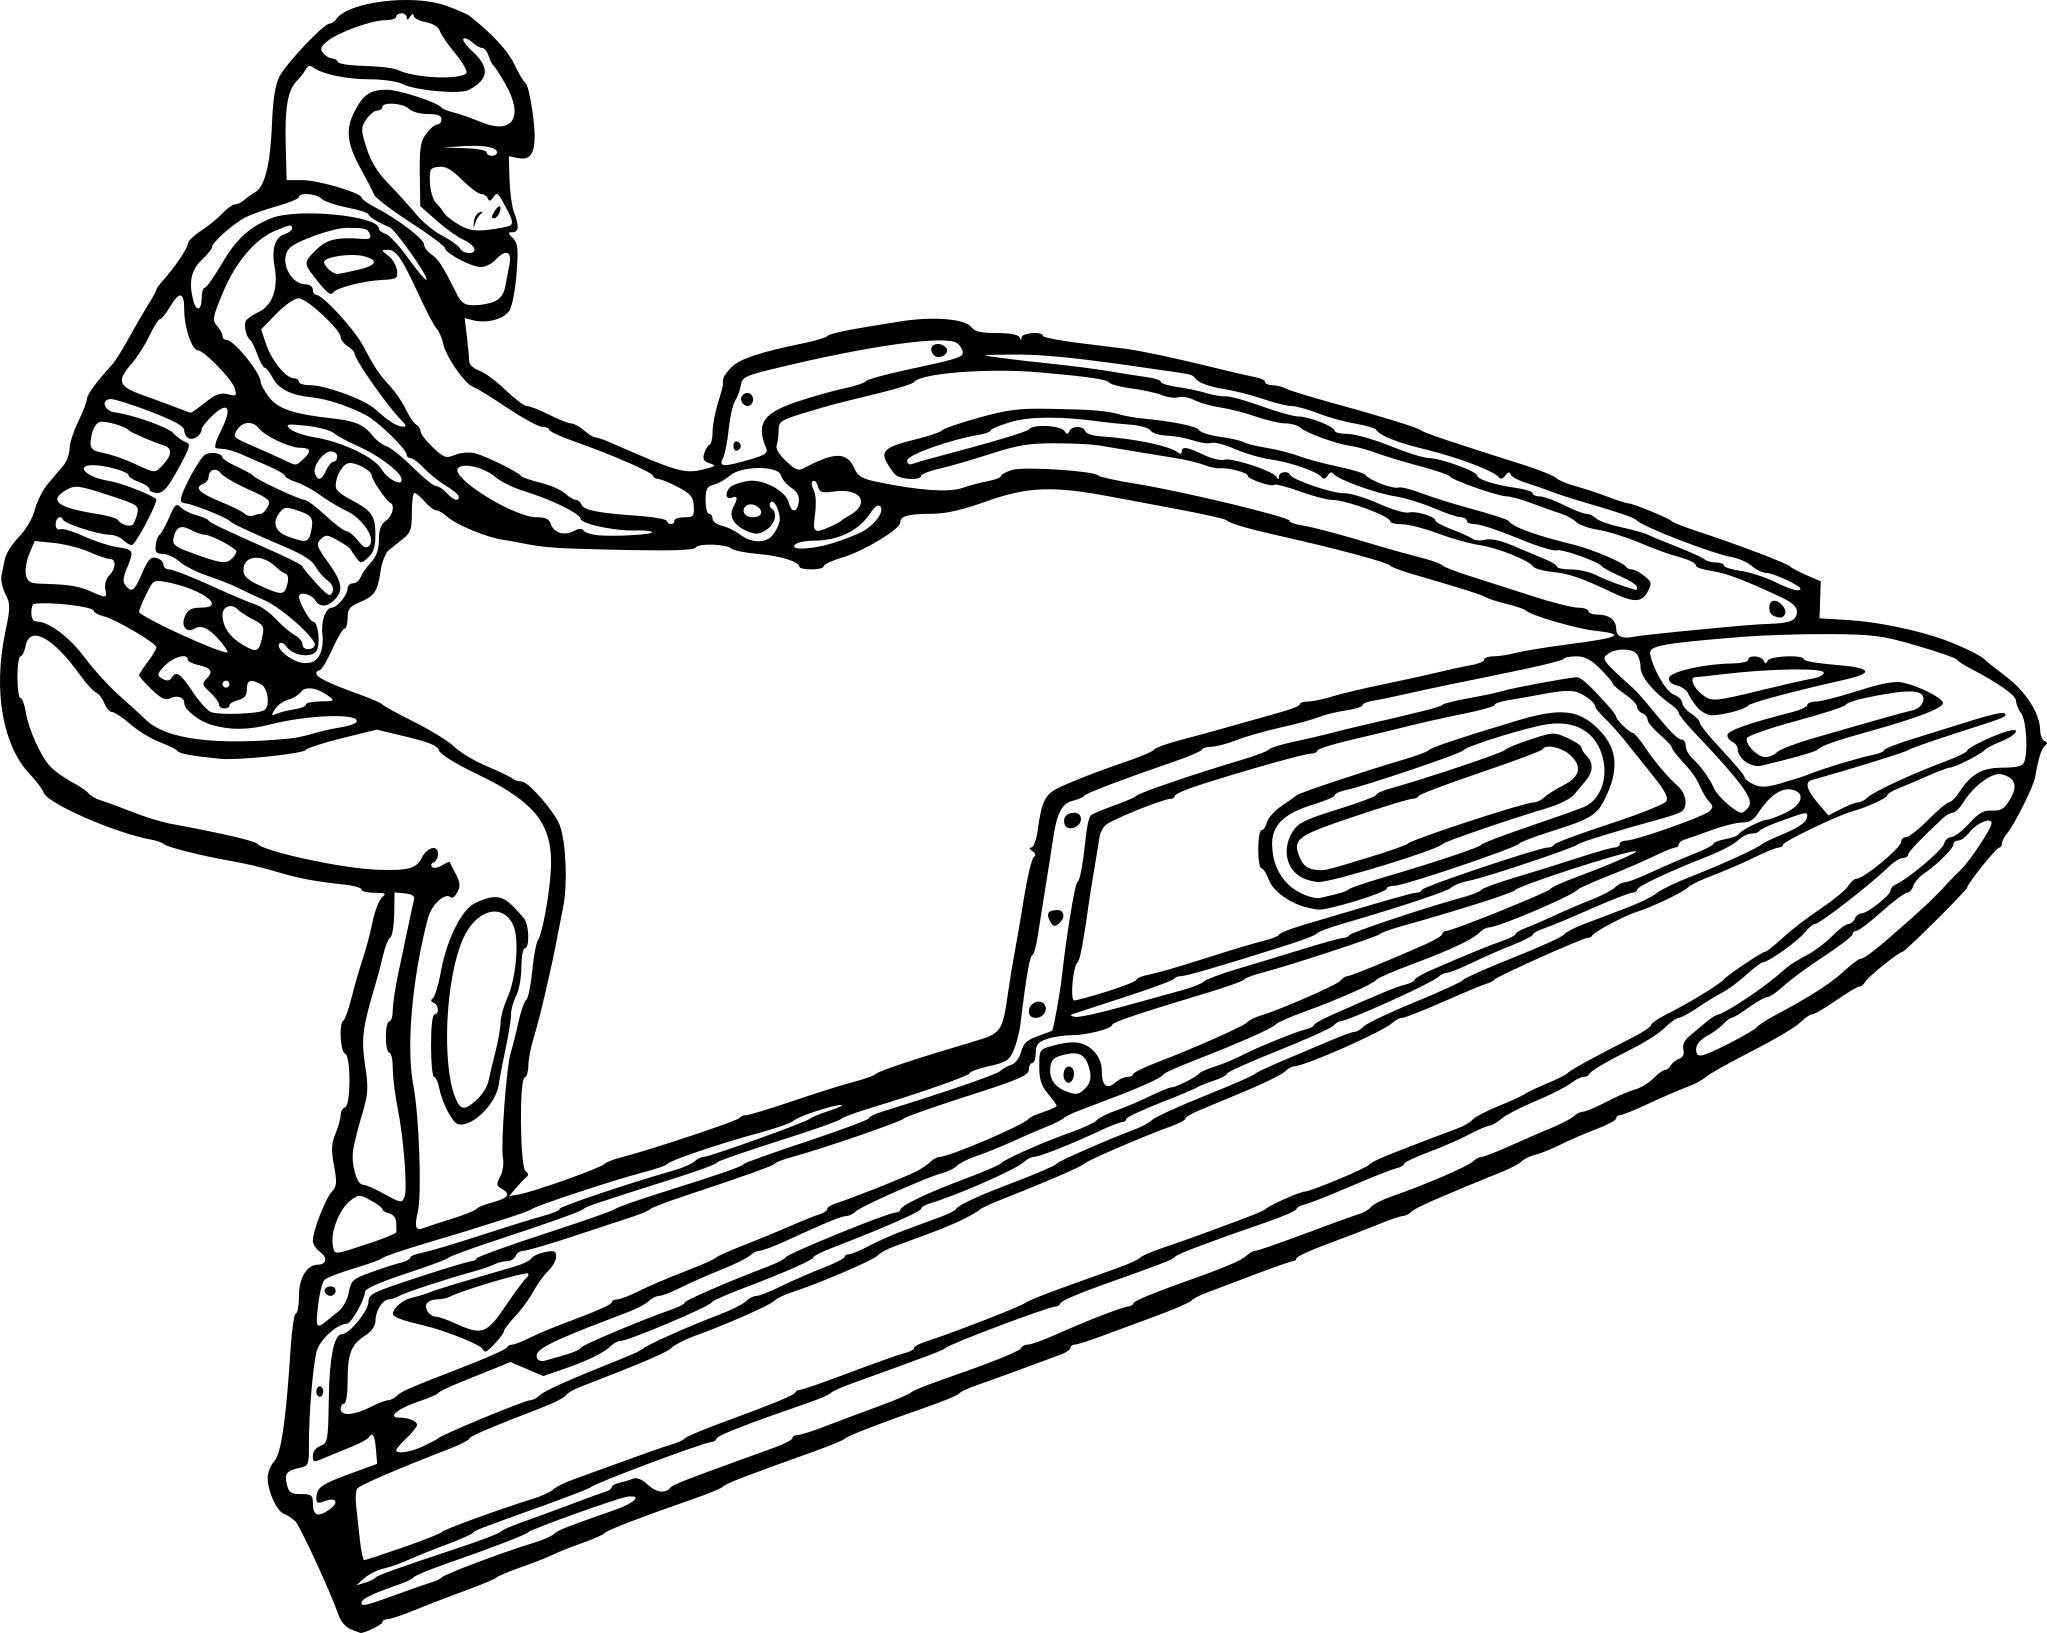 Coloriage Jet Ski à Imprimer